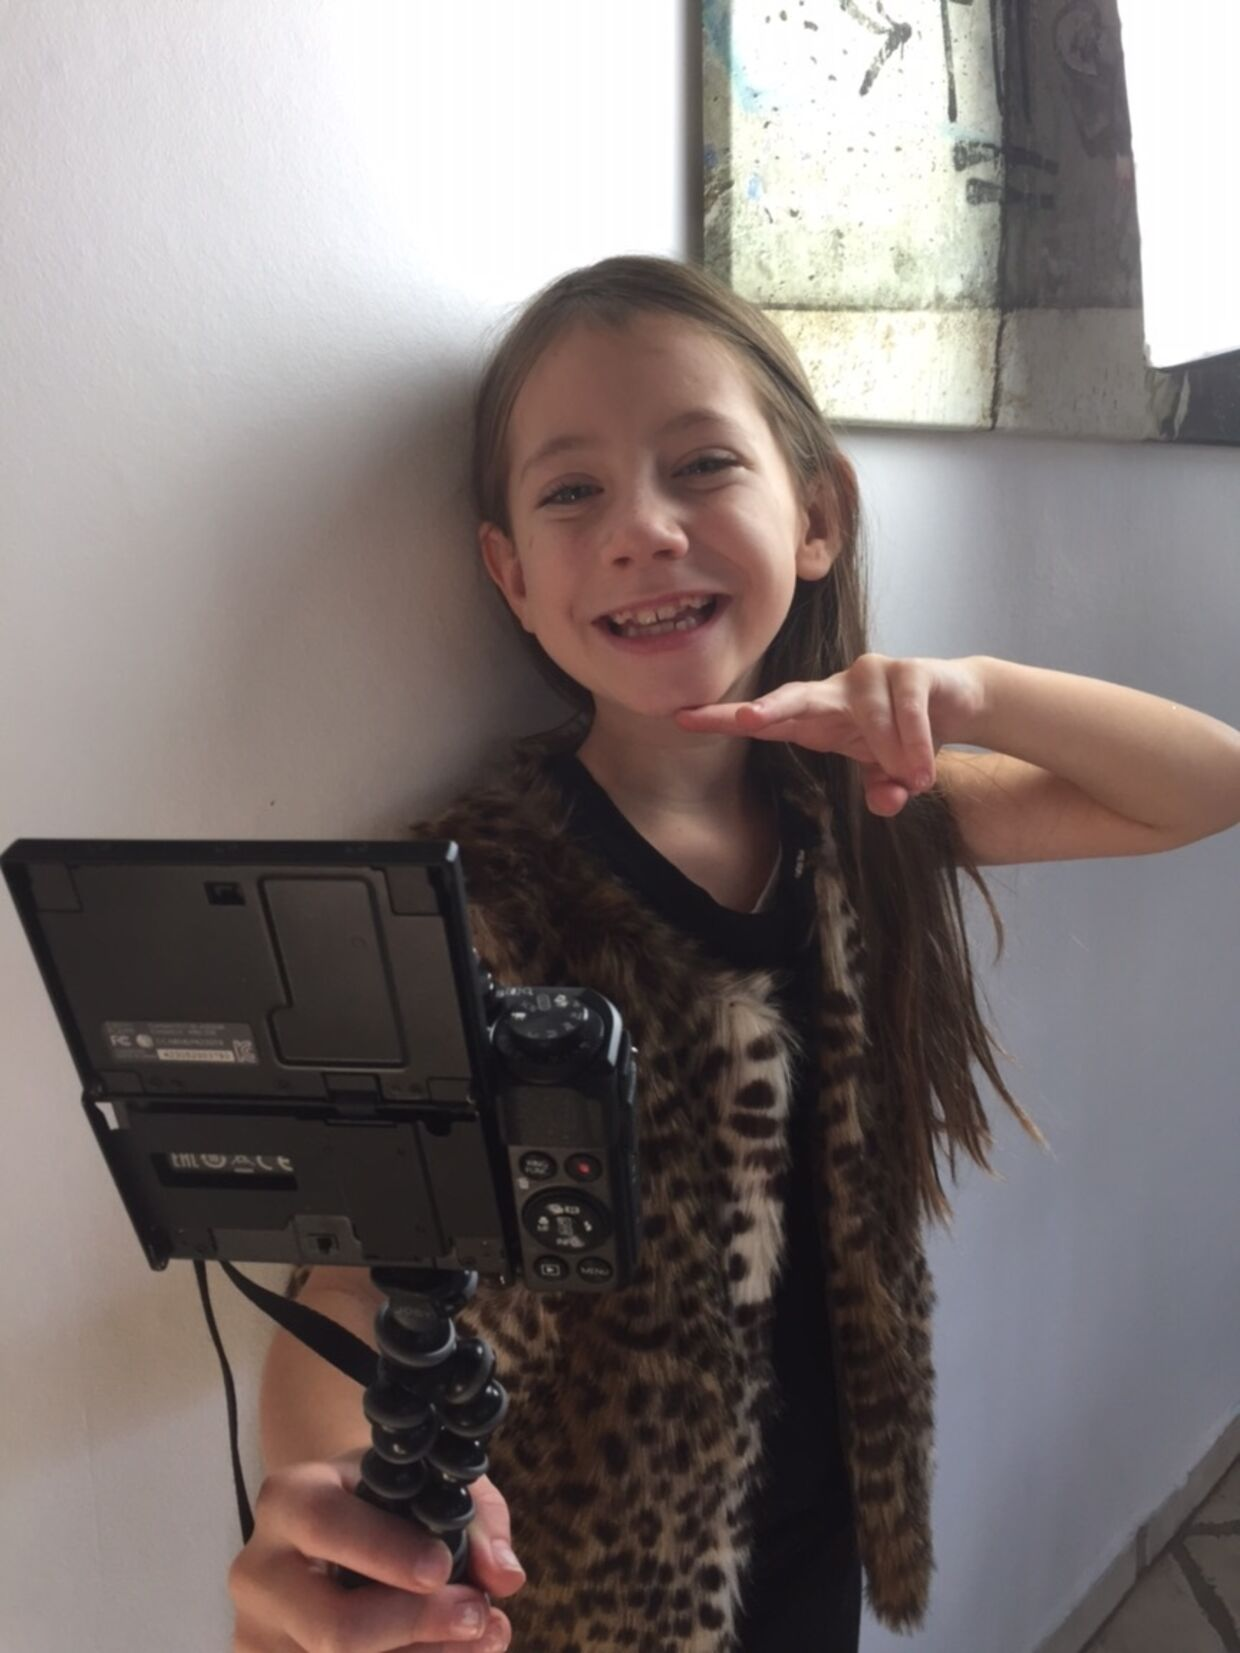 Naja Münster er 9 år gammel og har 183.000 følgere på Youtube. Foto: Privatfoto.